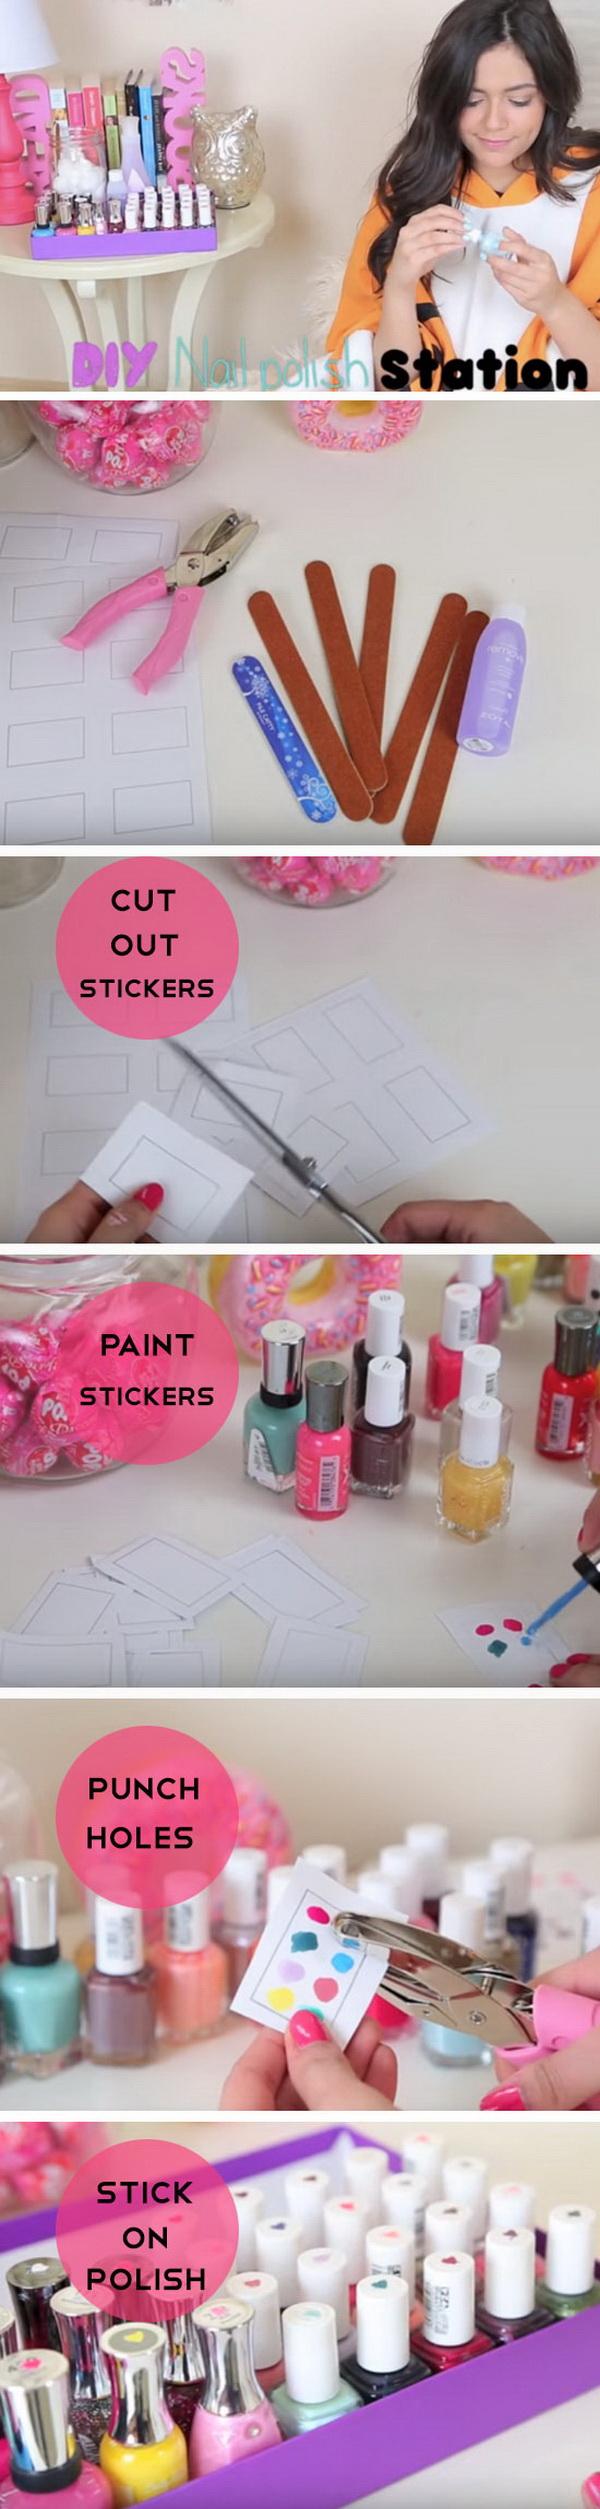 DIY Nail Polish Station. Easy access to your nail polish next time with this creative DIY!